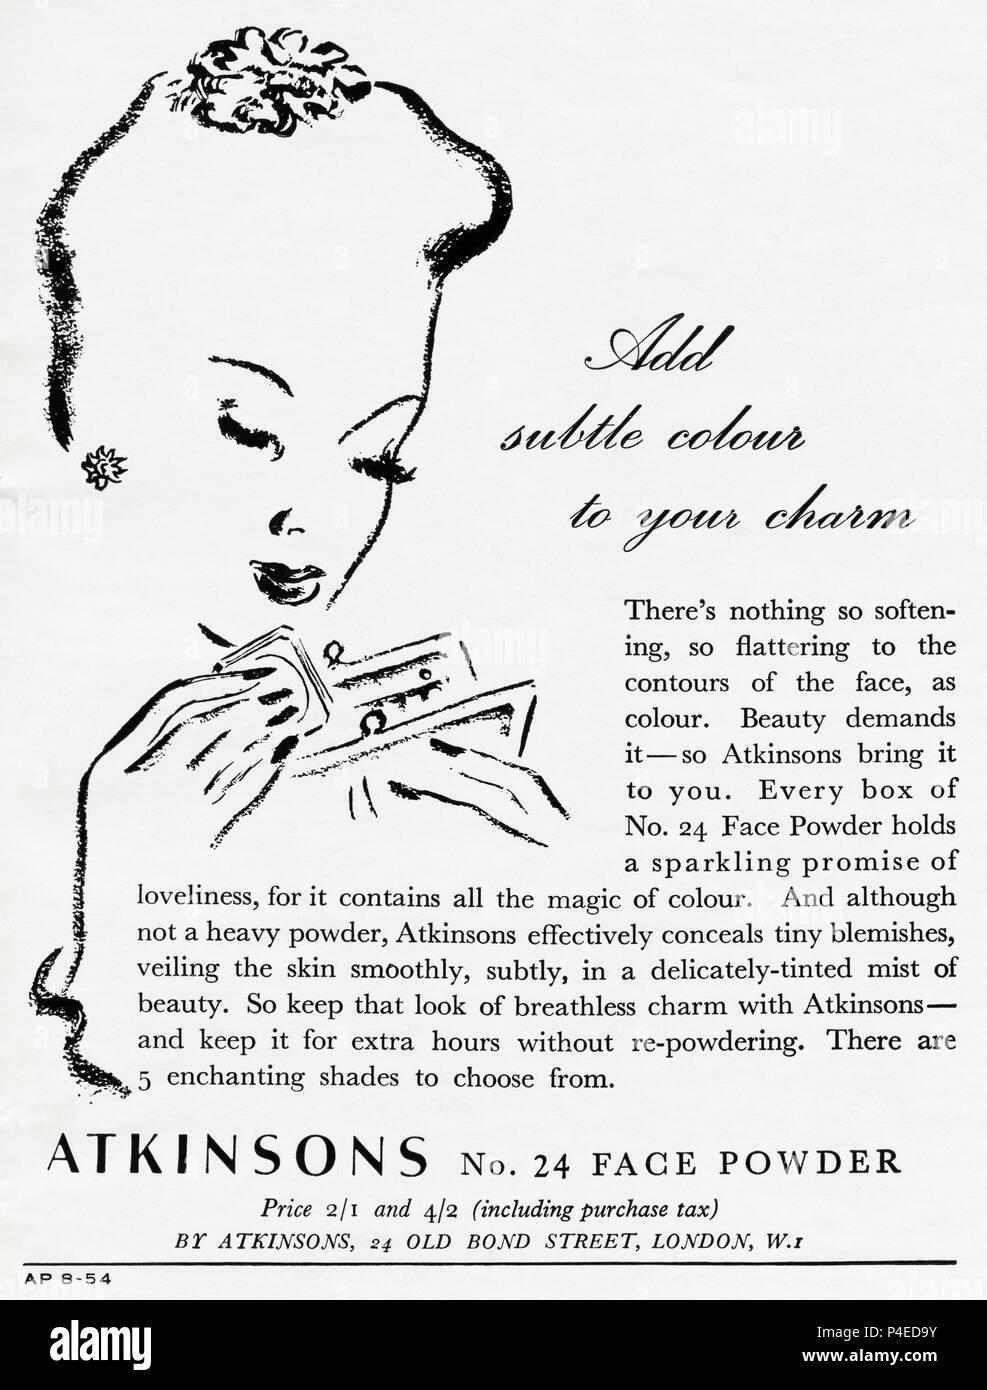 1940s old vintage original advert advertising Atkinsons No 24 Face Powder in English magazine circa 1946 when supplies were still restricted under post-war rationing - Stock Image